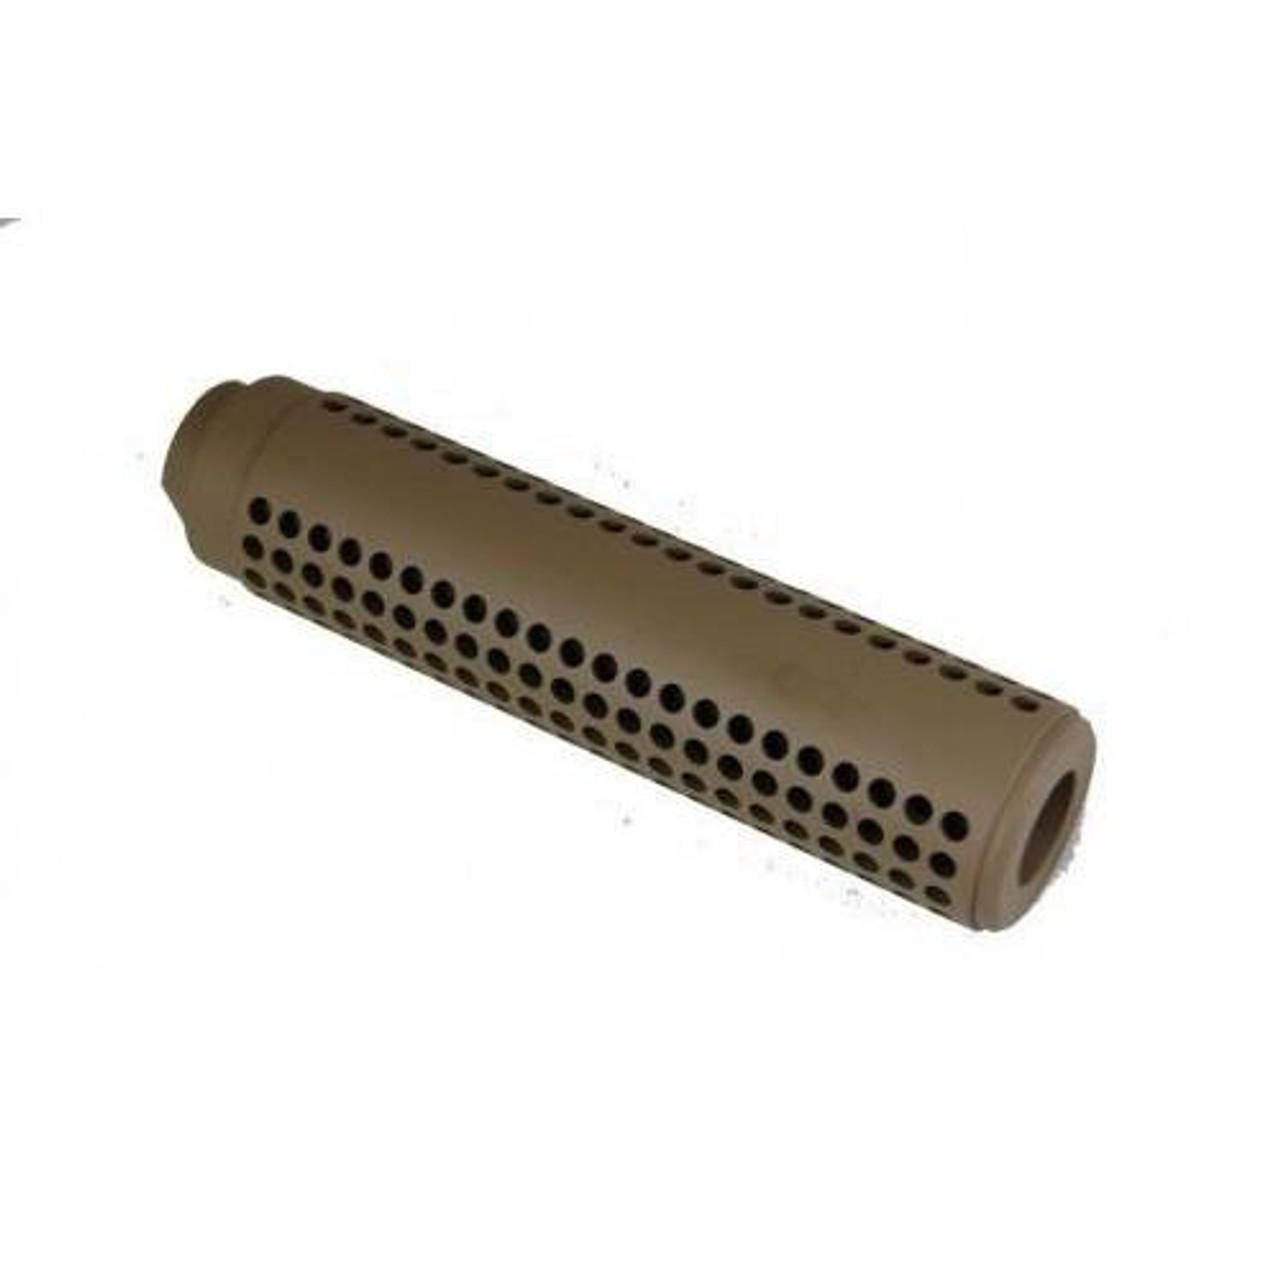 Guntec AR15 Reverse Thread Slip Over SOCOM Style Fake Suppressor - 1/2x28